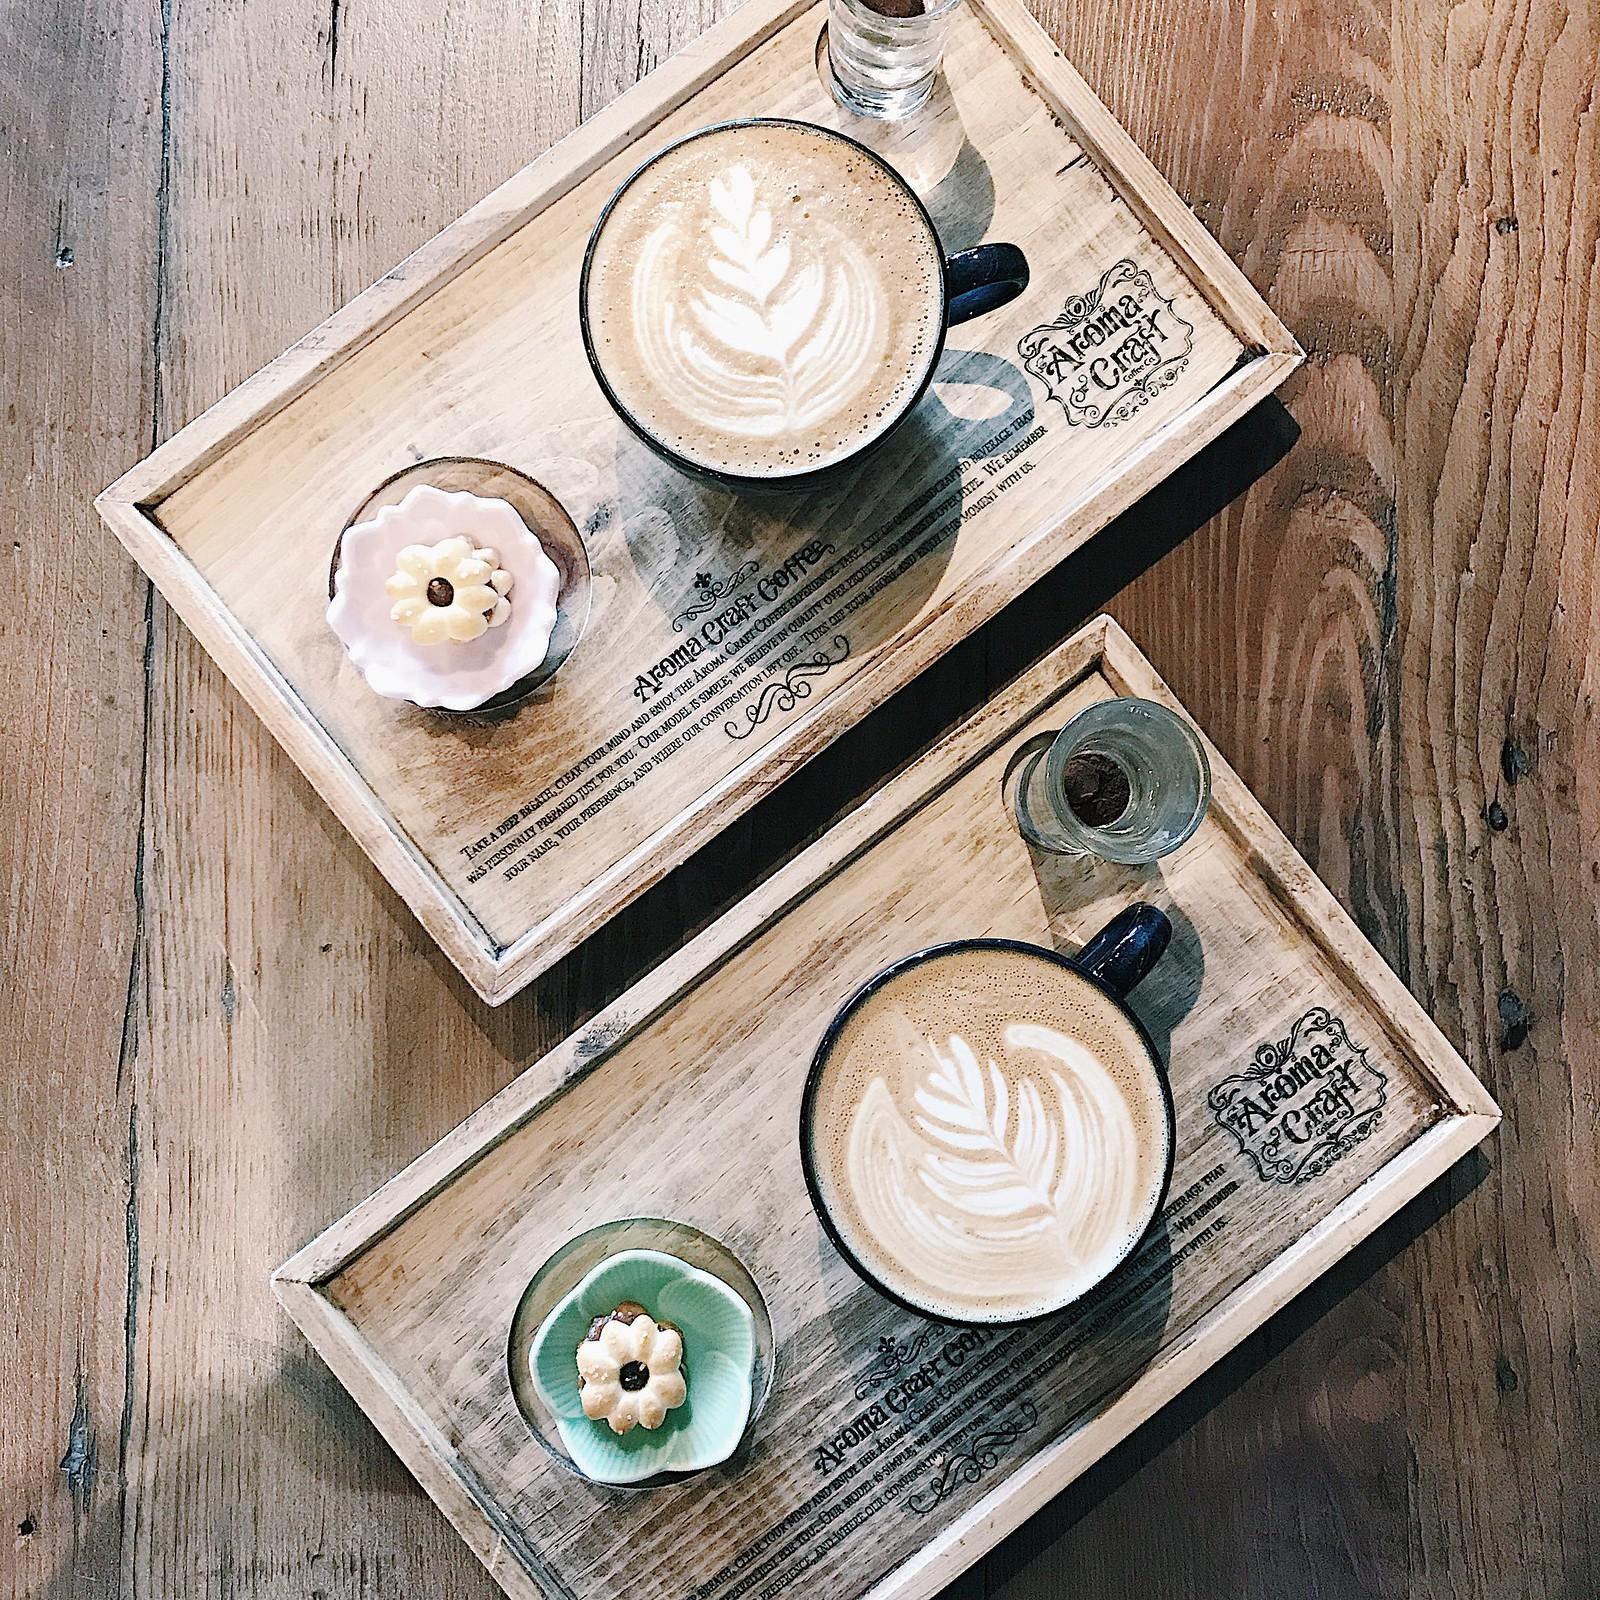 onthetable-flatlay-coffee-latte-coffeeart-latteart-coffeeshots-hipster-dineLA